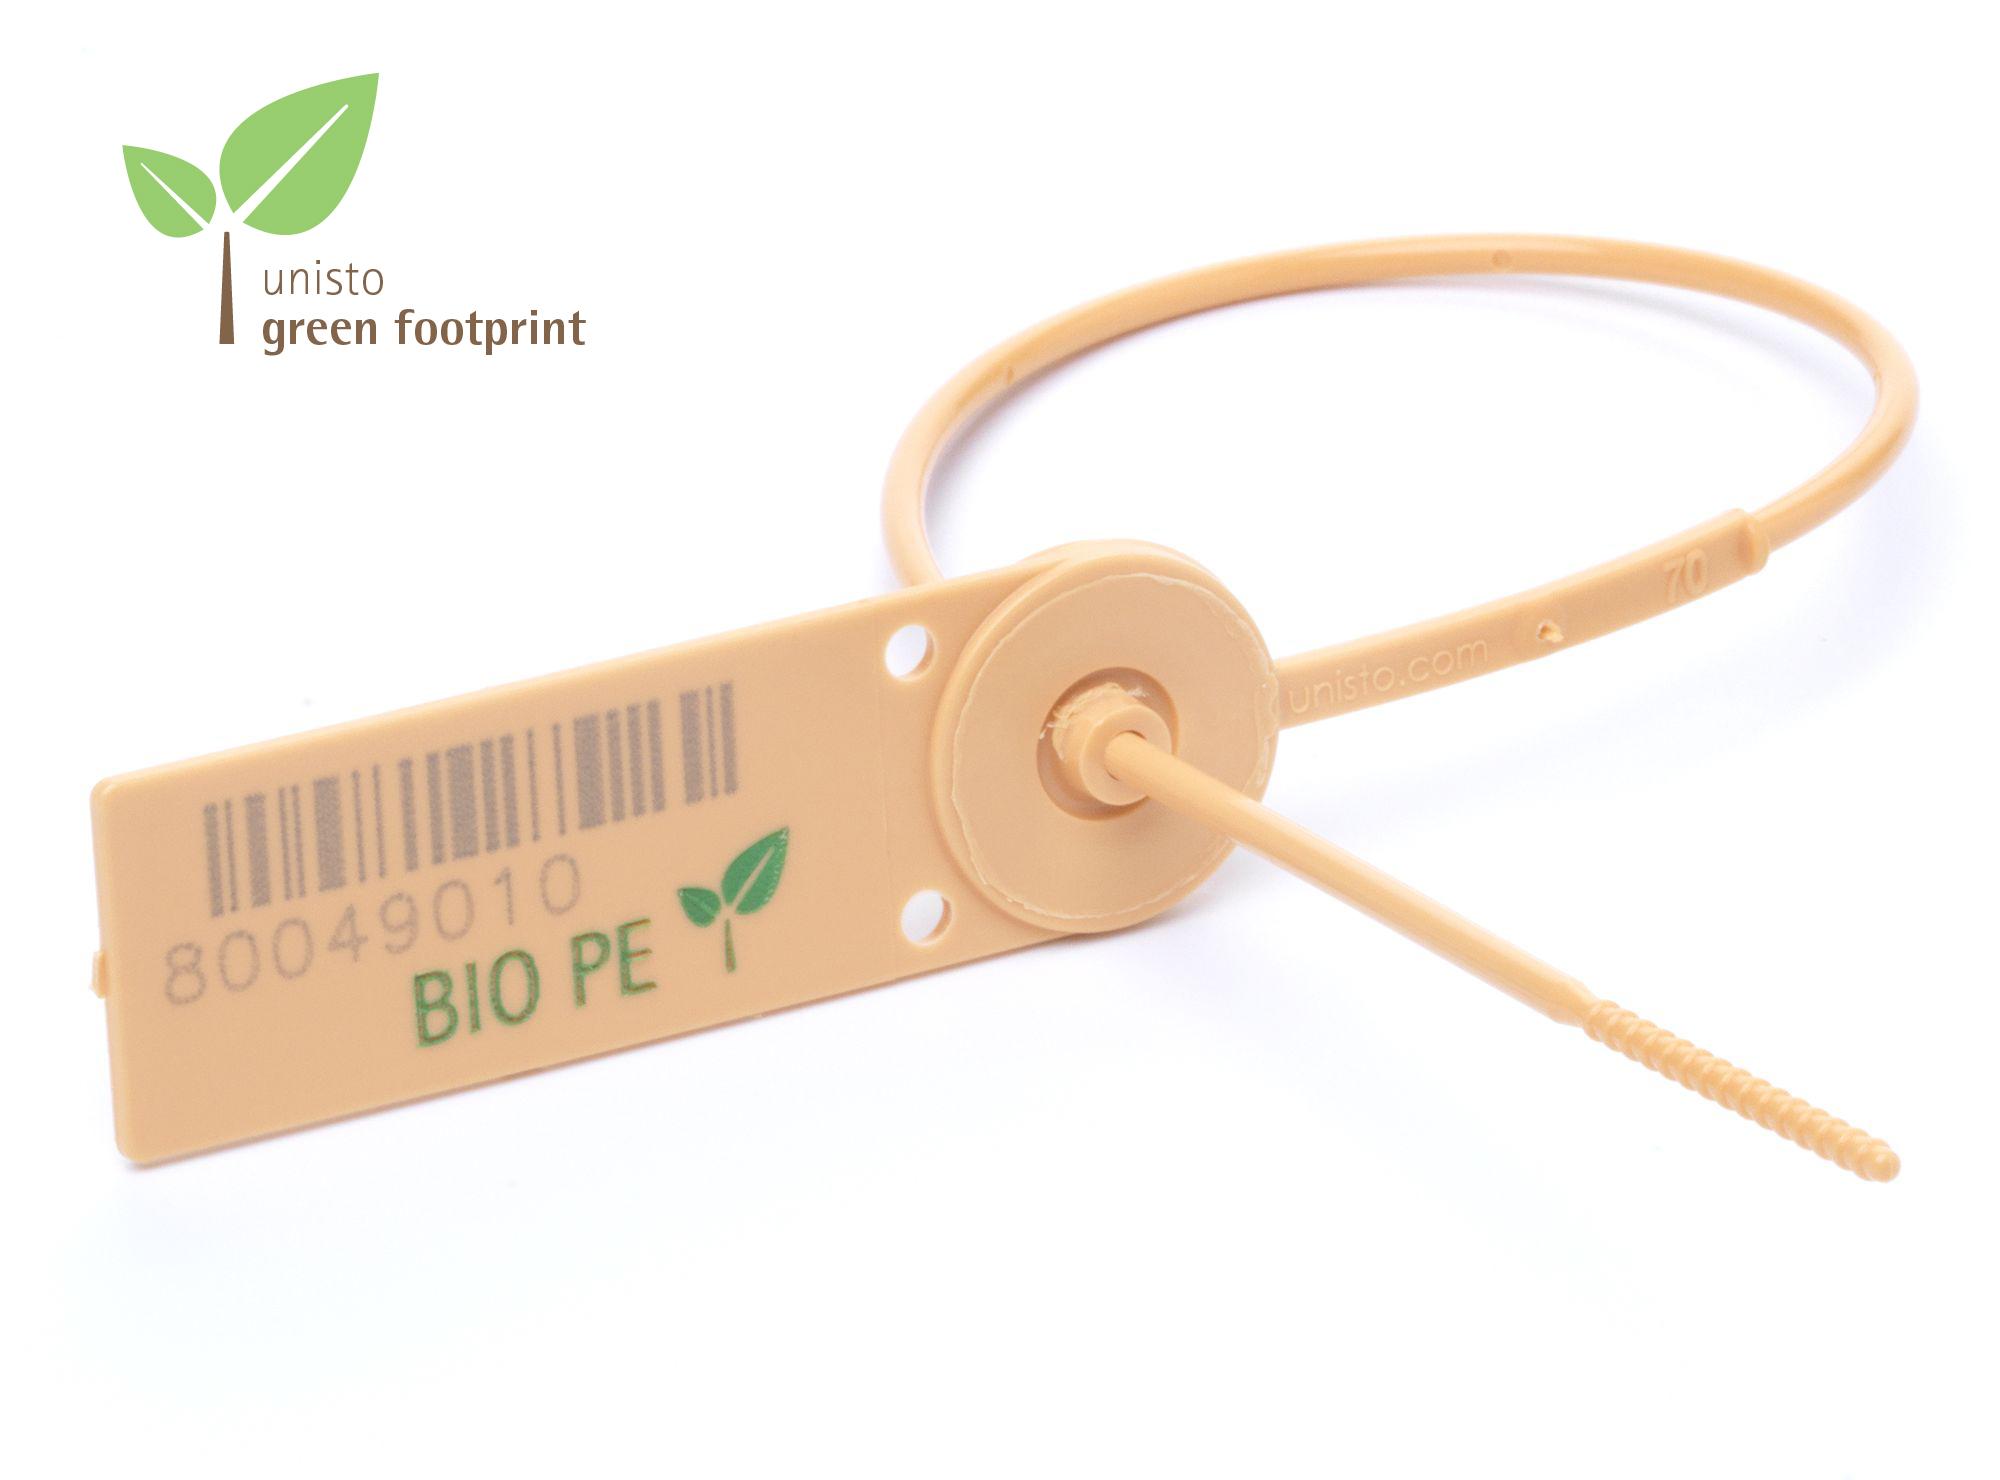 Unisto Compact eco (Bio PE)